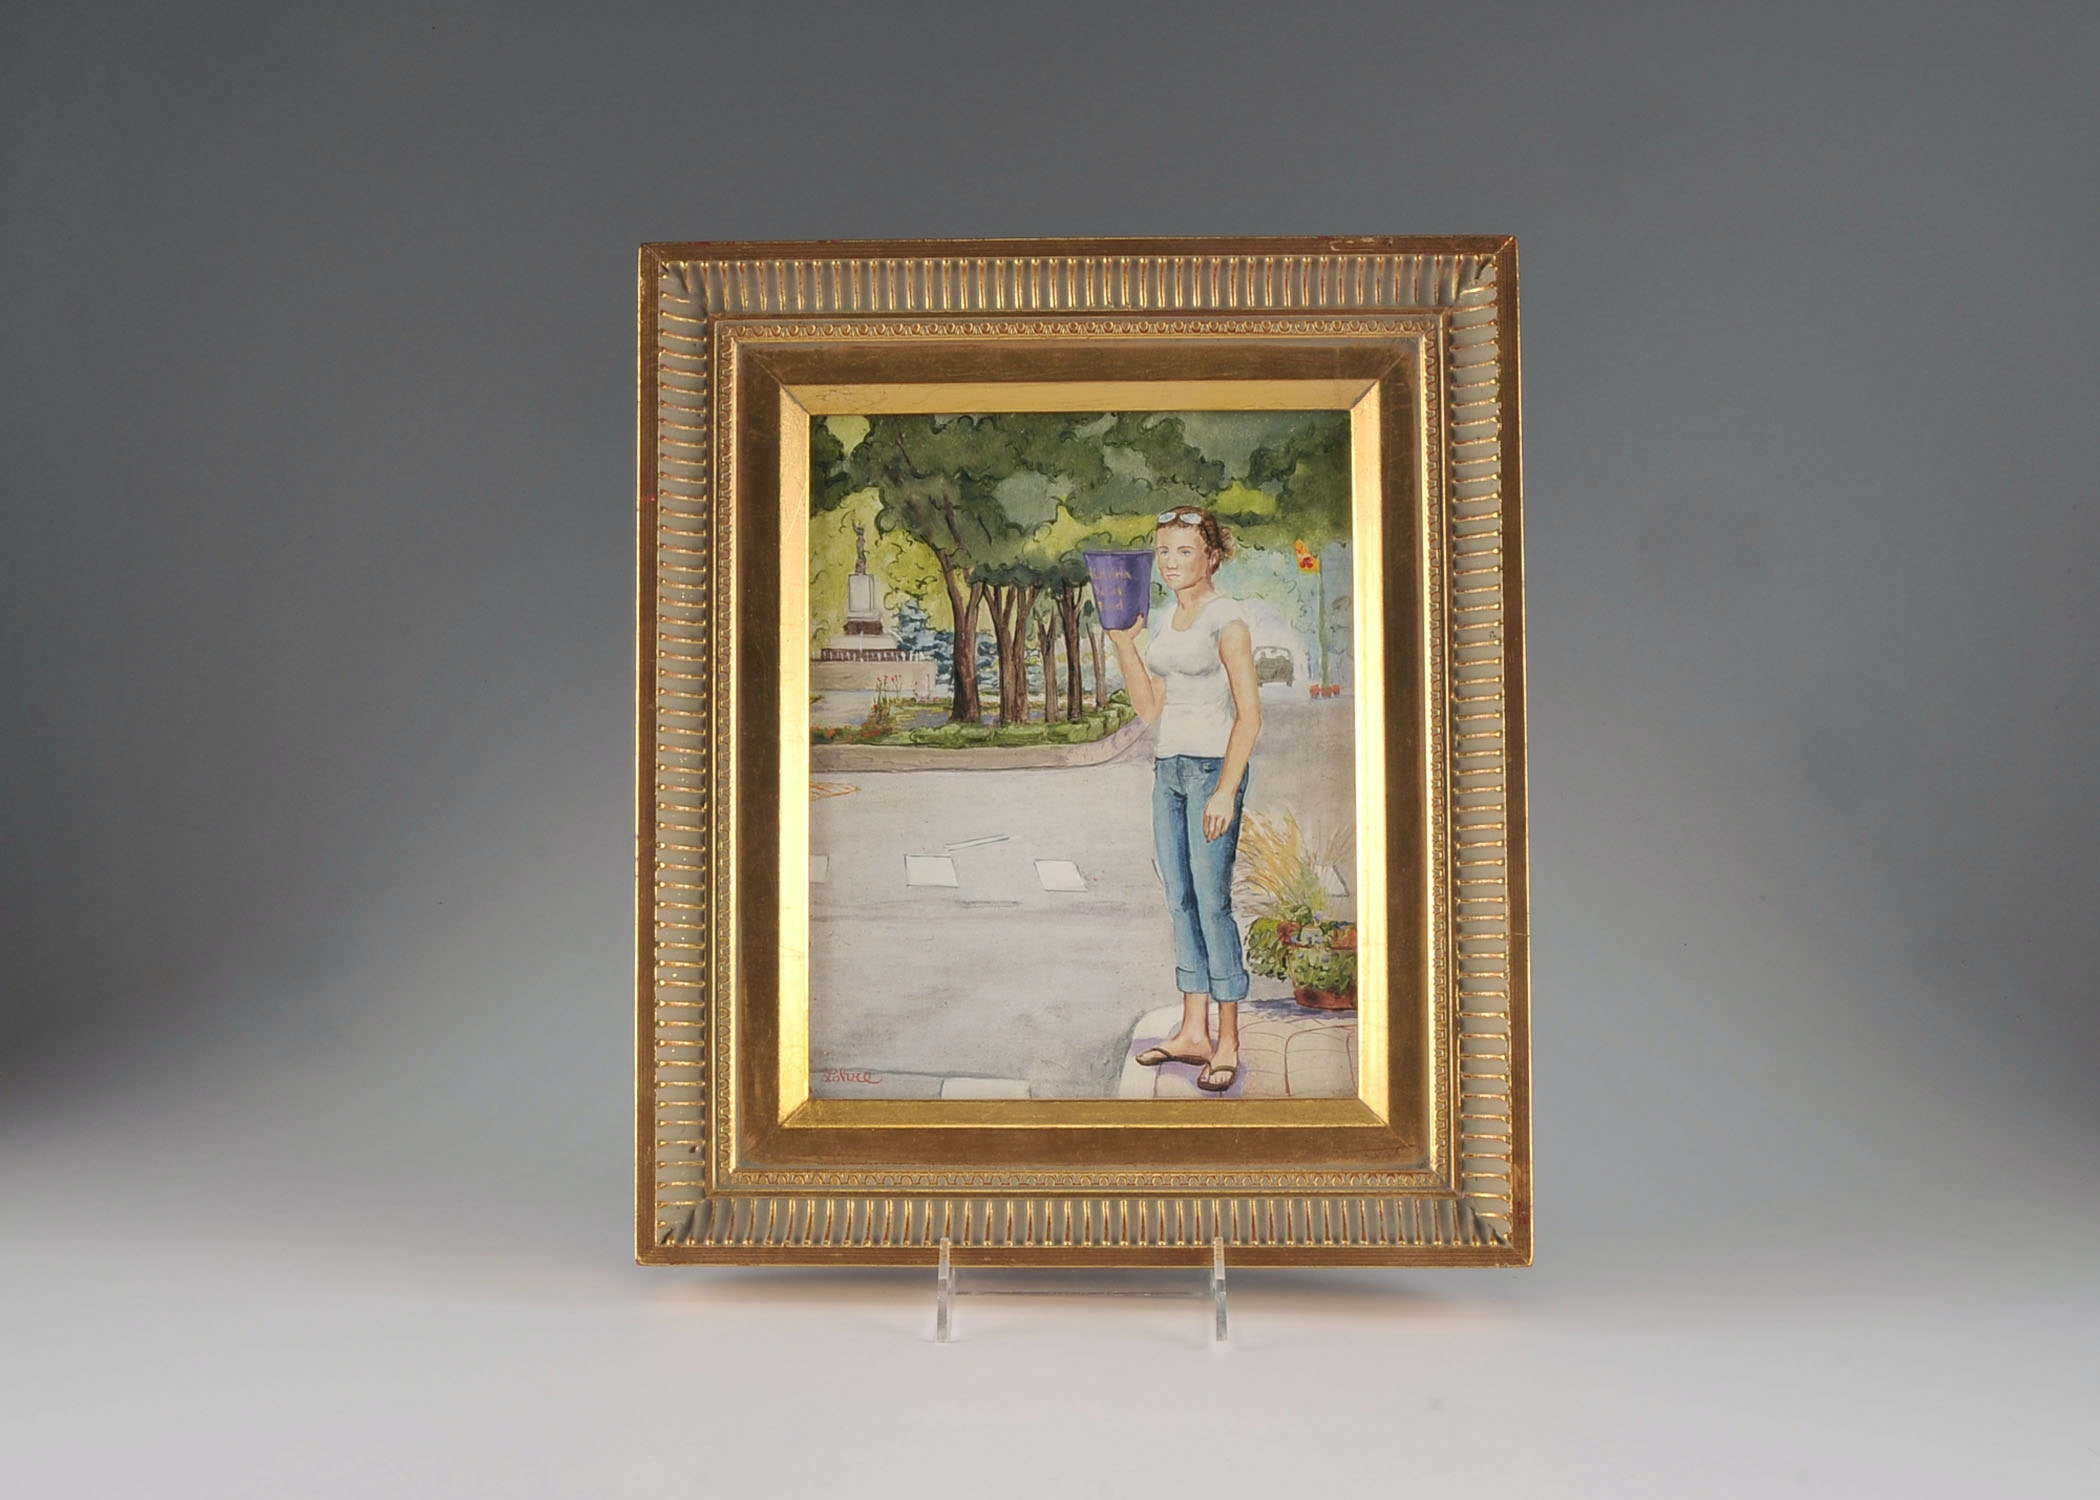 Original Tom Lohre Oil on Board Painting